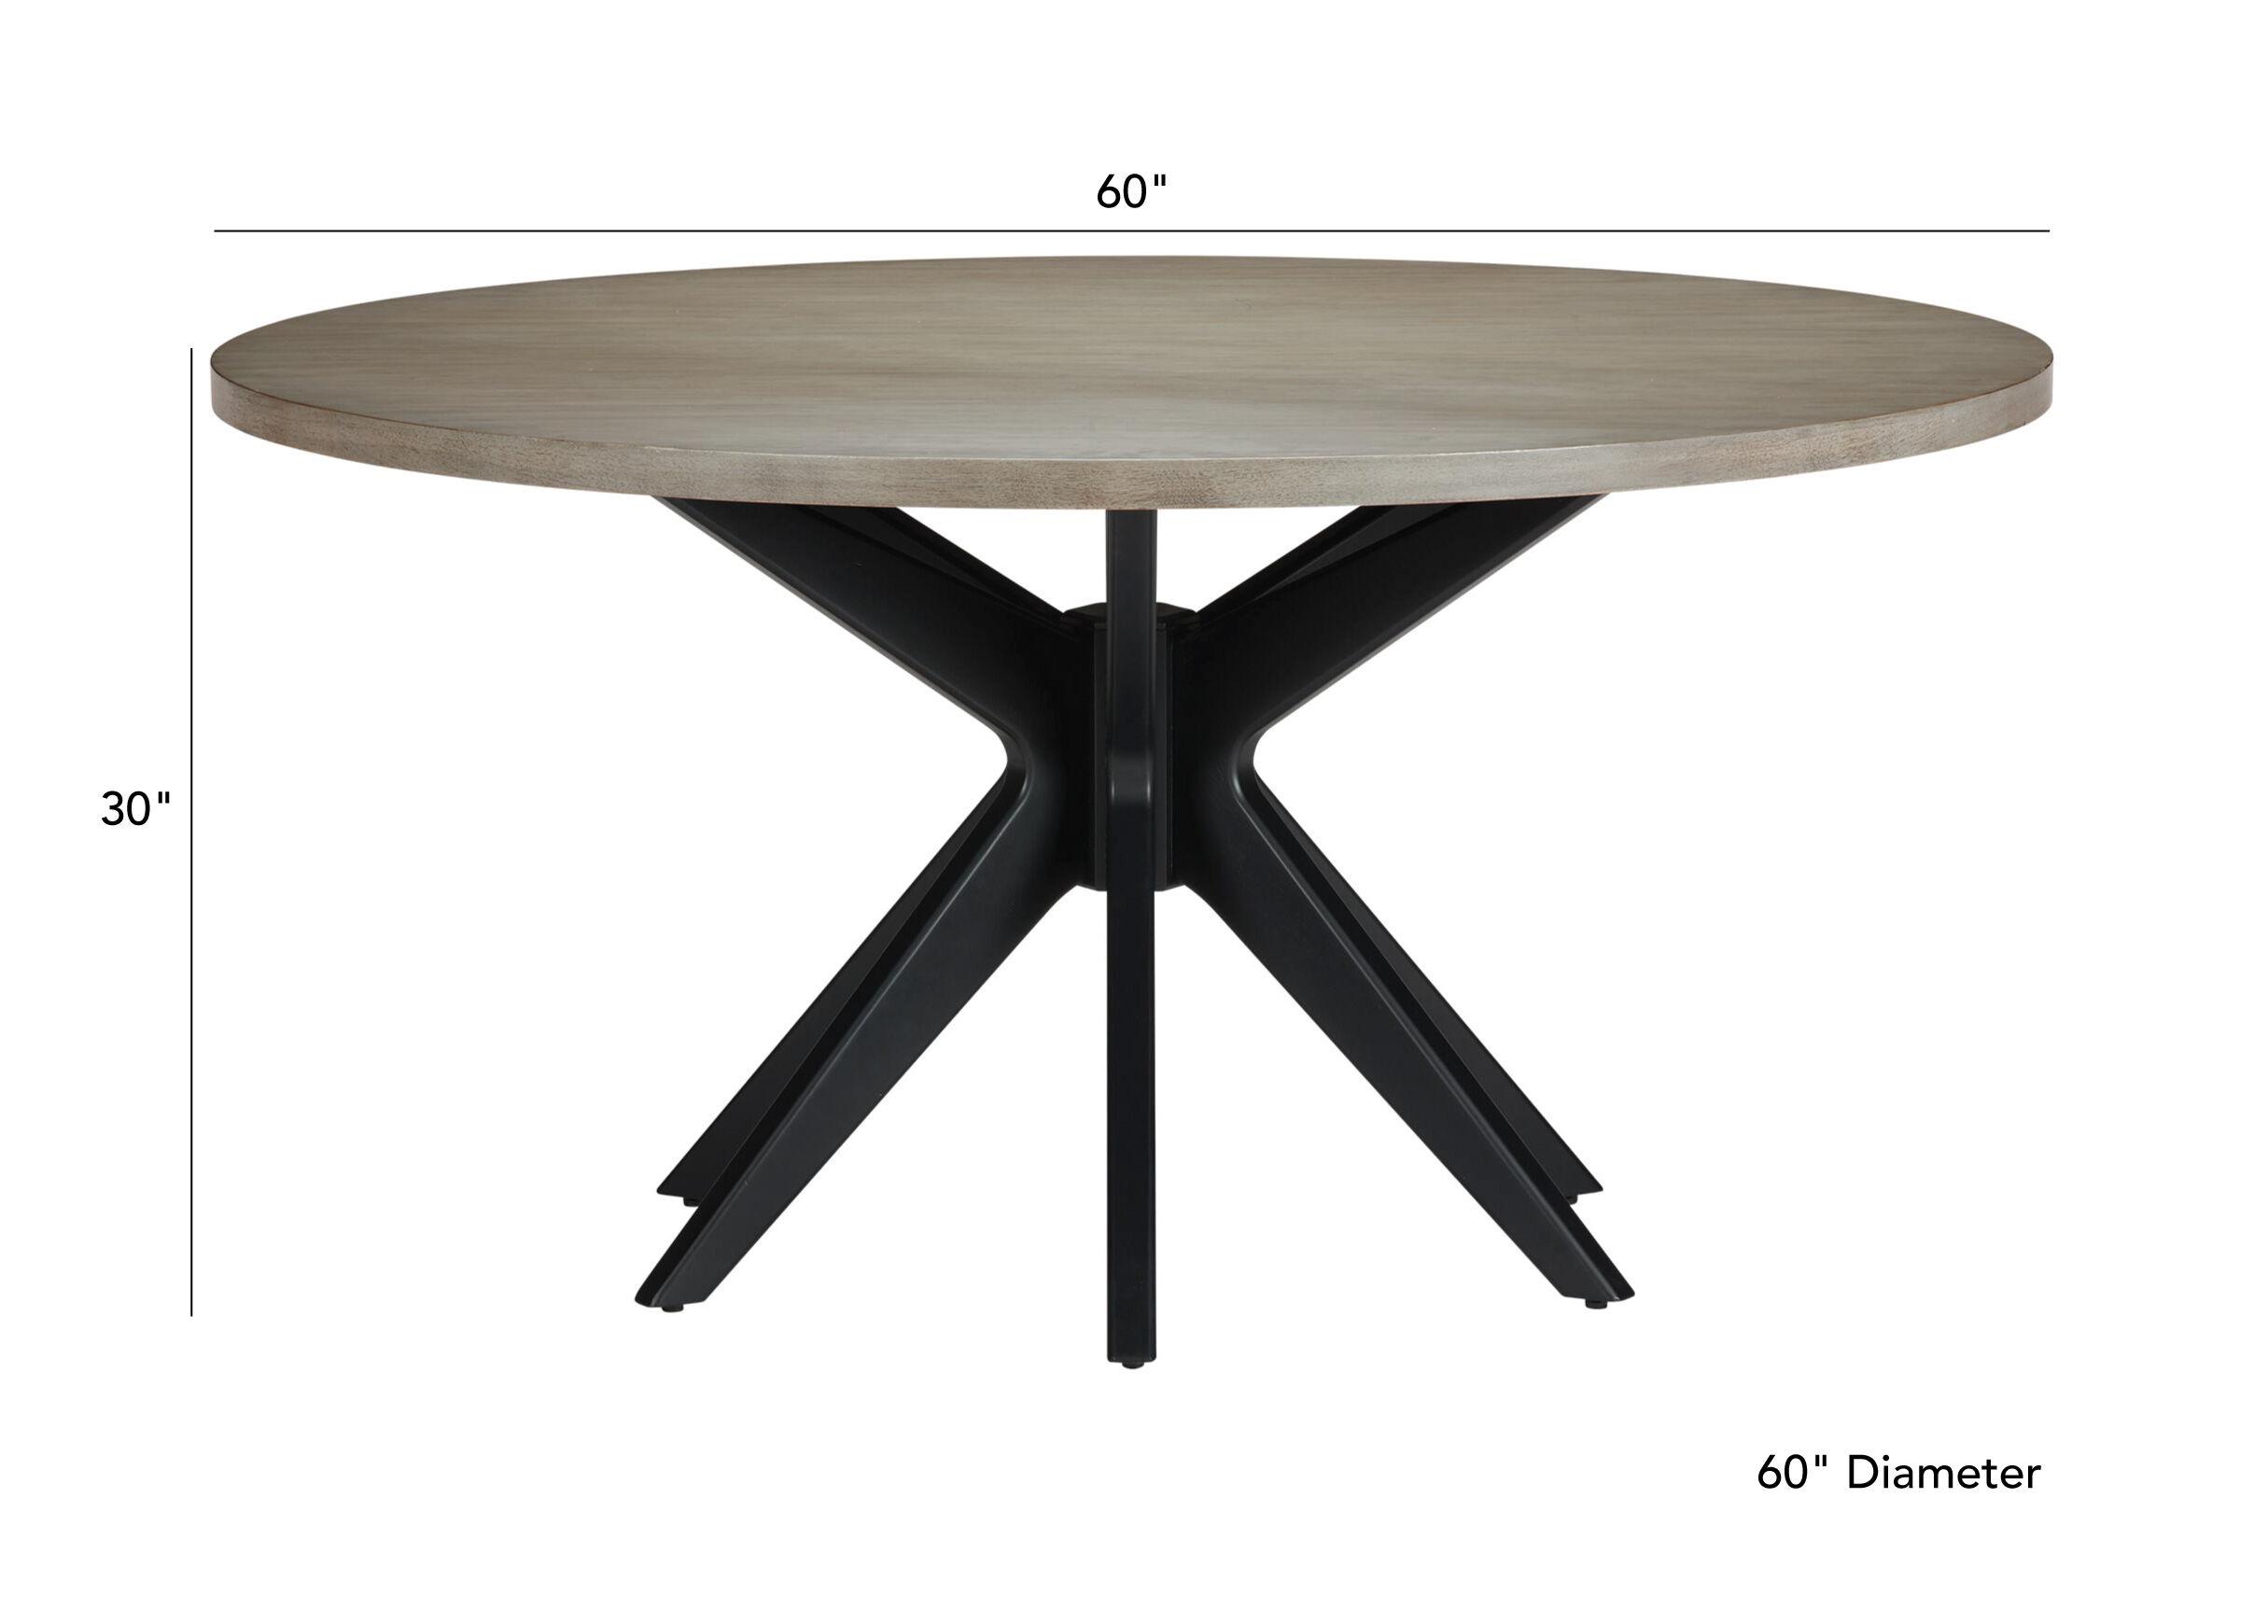 Hazelton Midcentury Modern Round Dining Table Ethan Allen